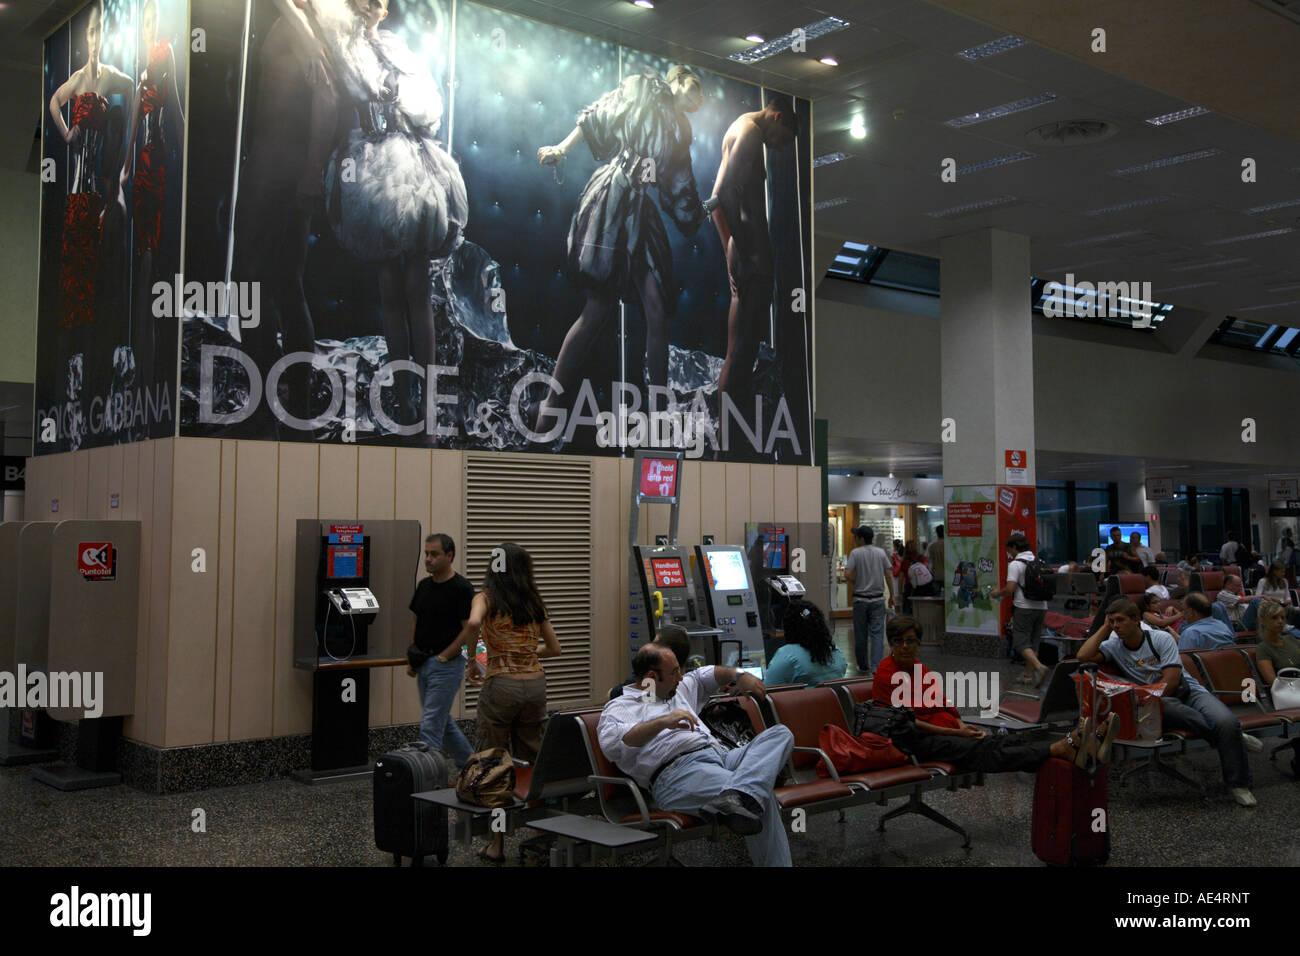 Dolce Gabbana Advert Departure Lounge Milan Airport Italy - Stock Image